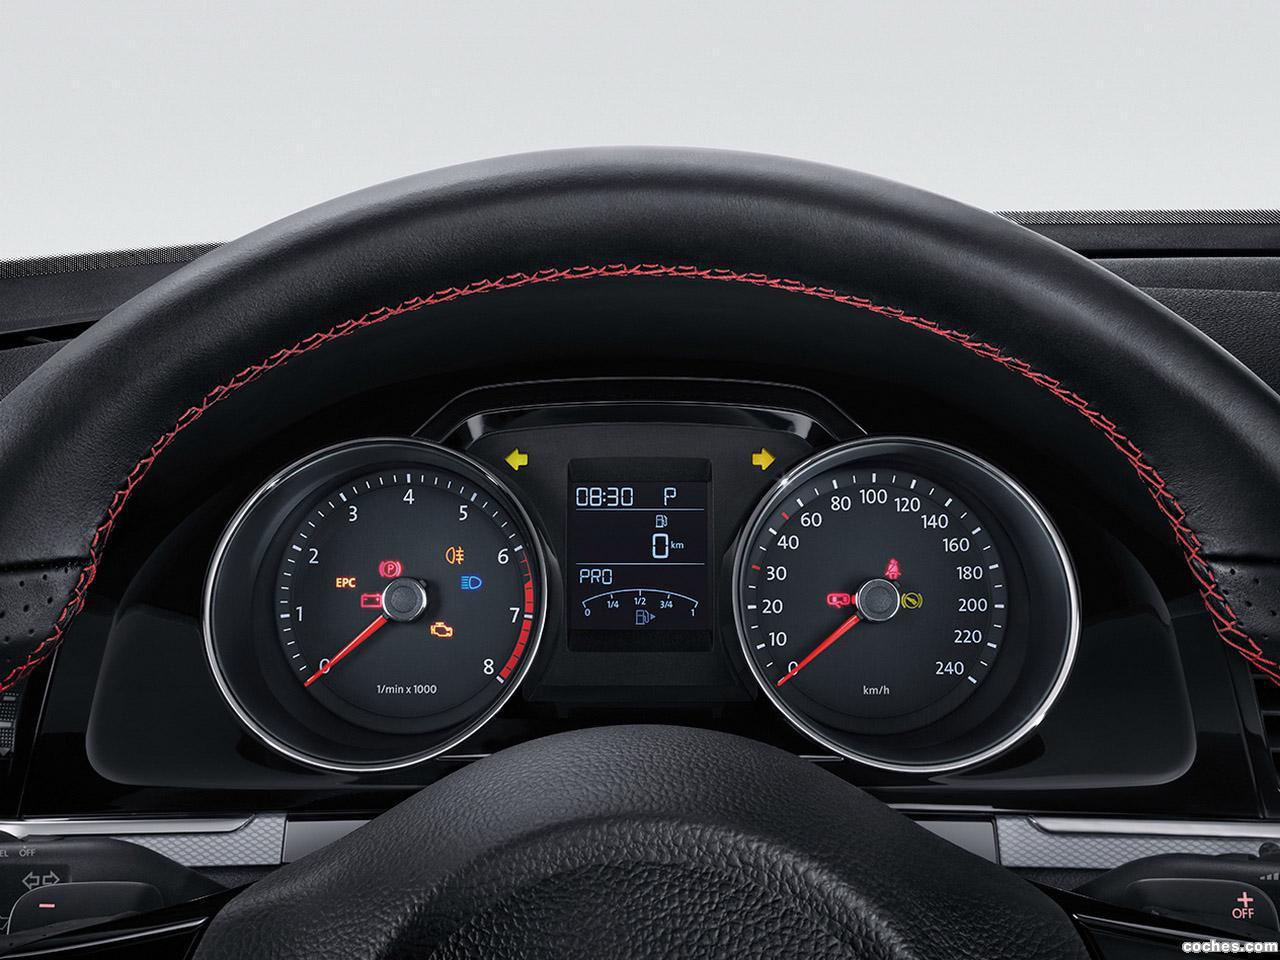 Foto 6 de Volkswagen Bora China 2014